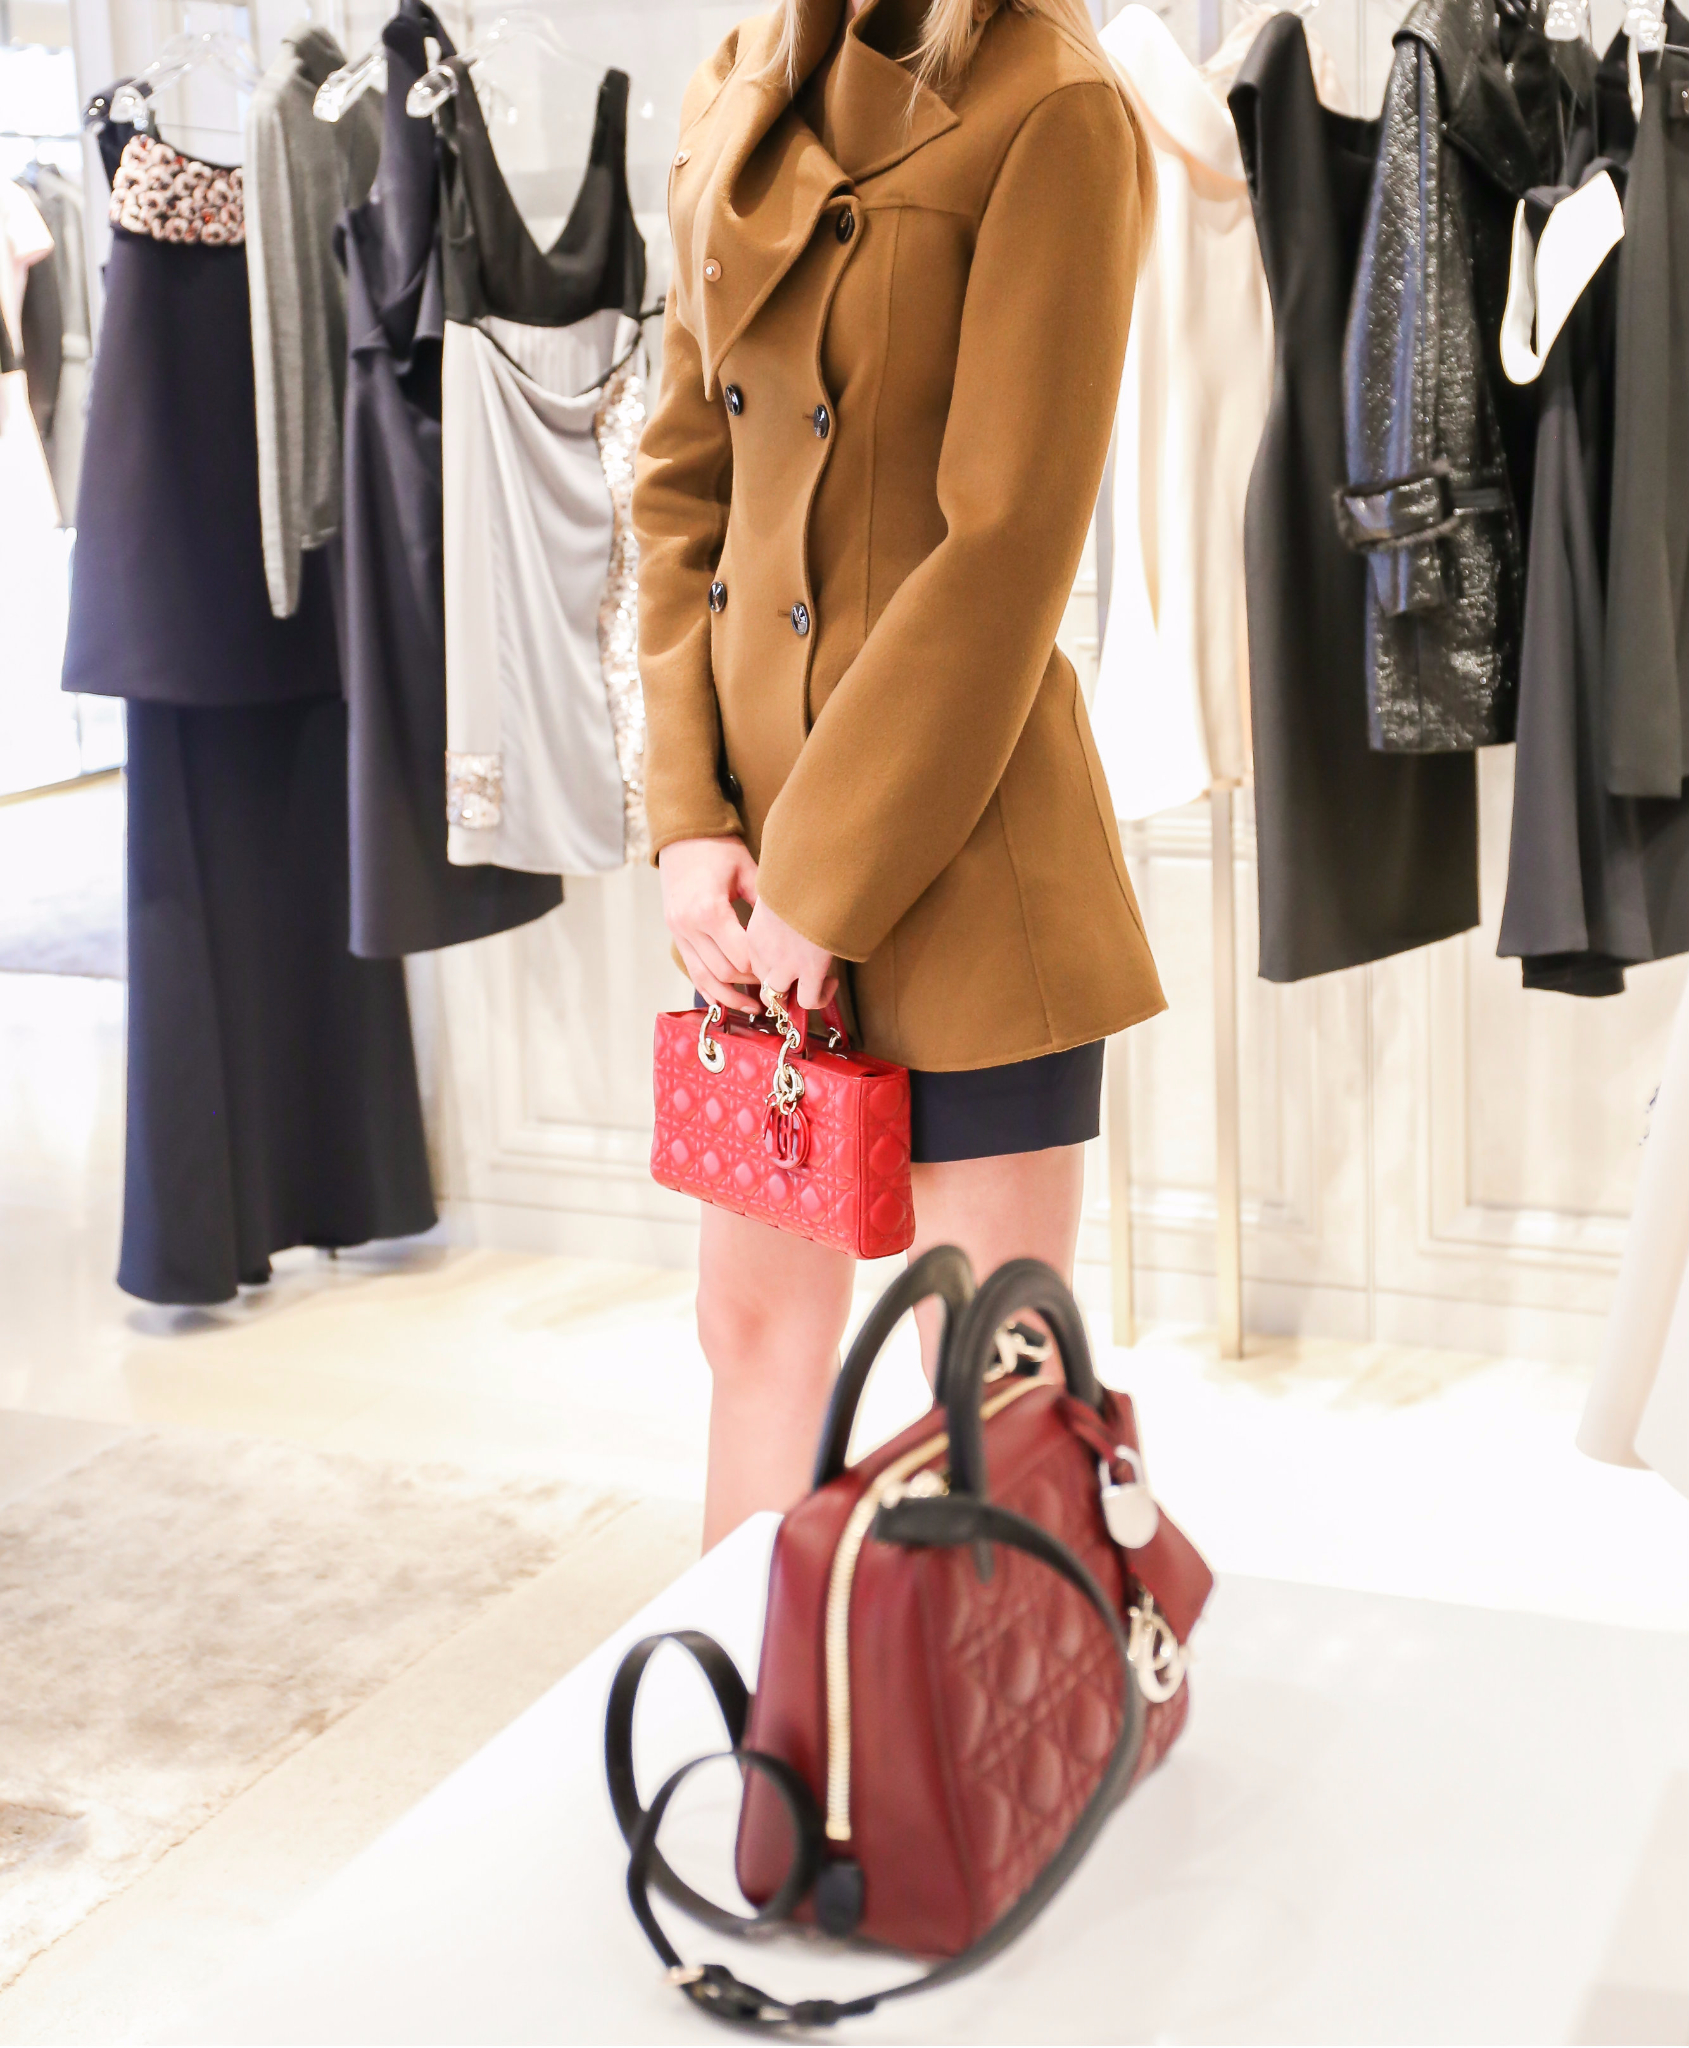 MOD-by-Monique-Fashion-Trends-Dior-Fall-Winter-2016-2017-63-1